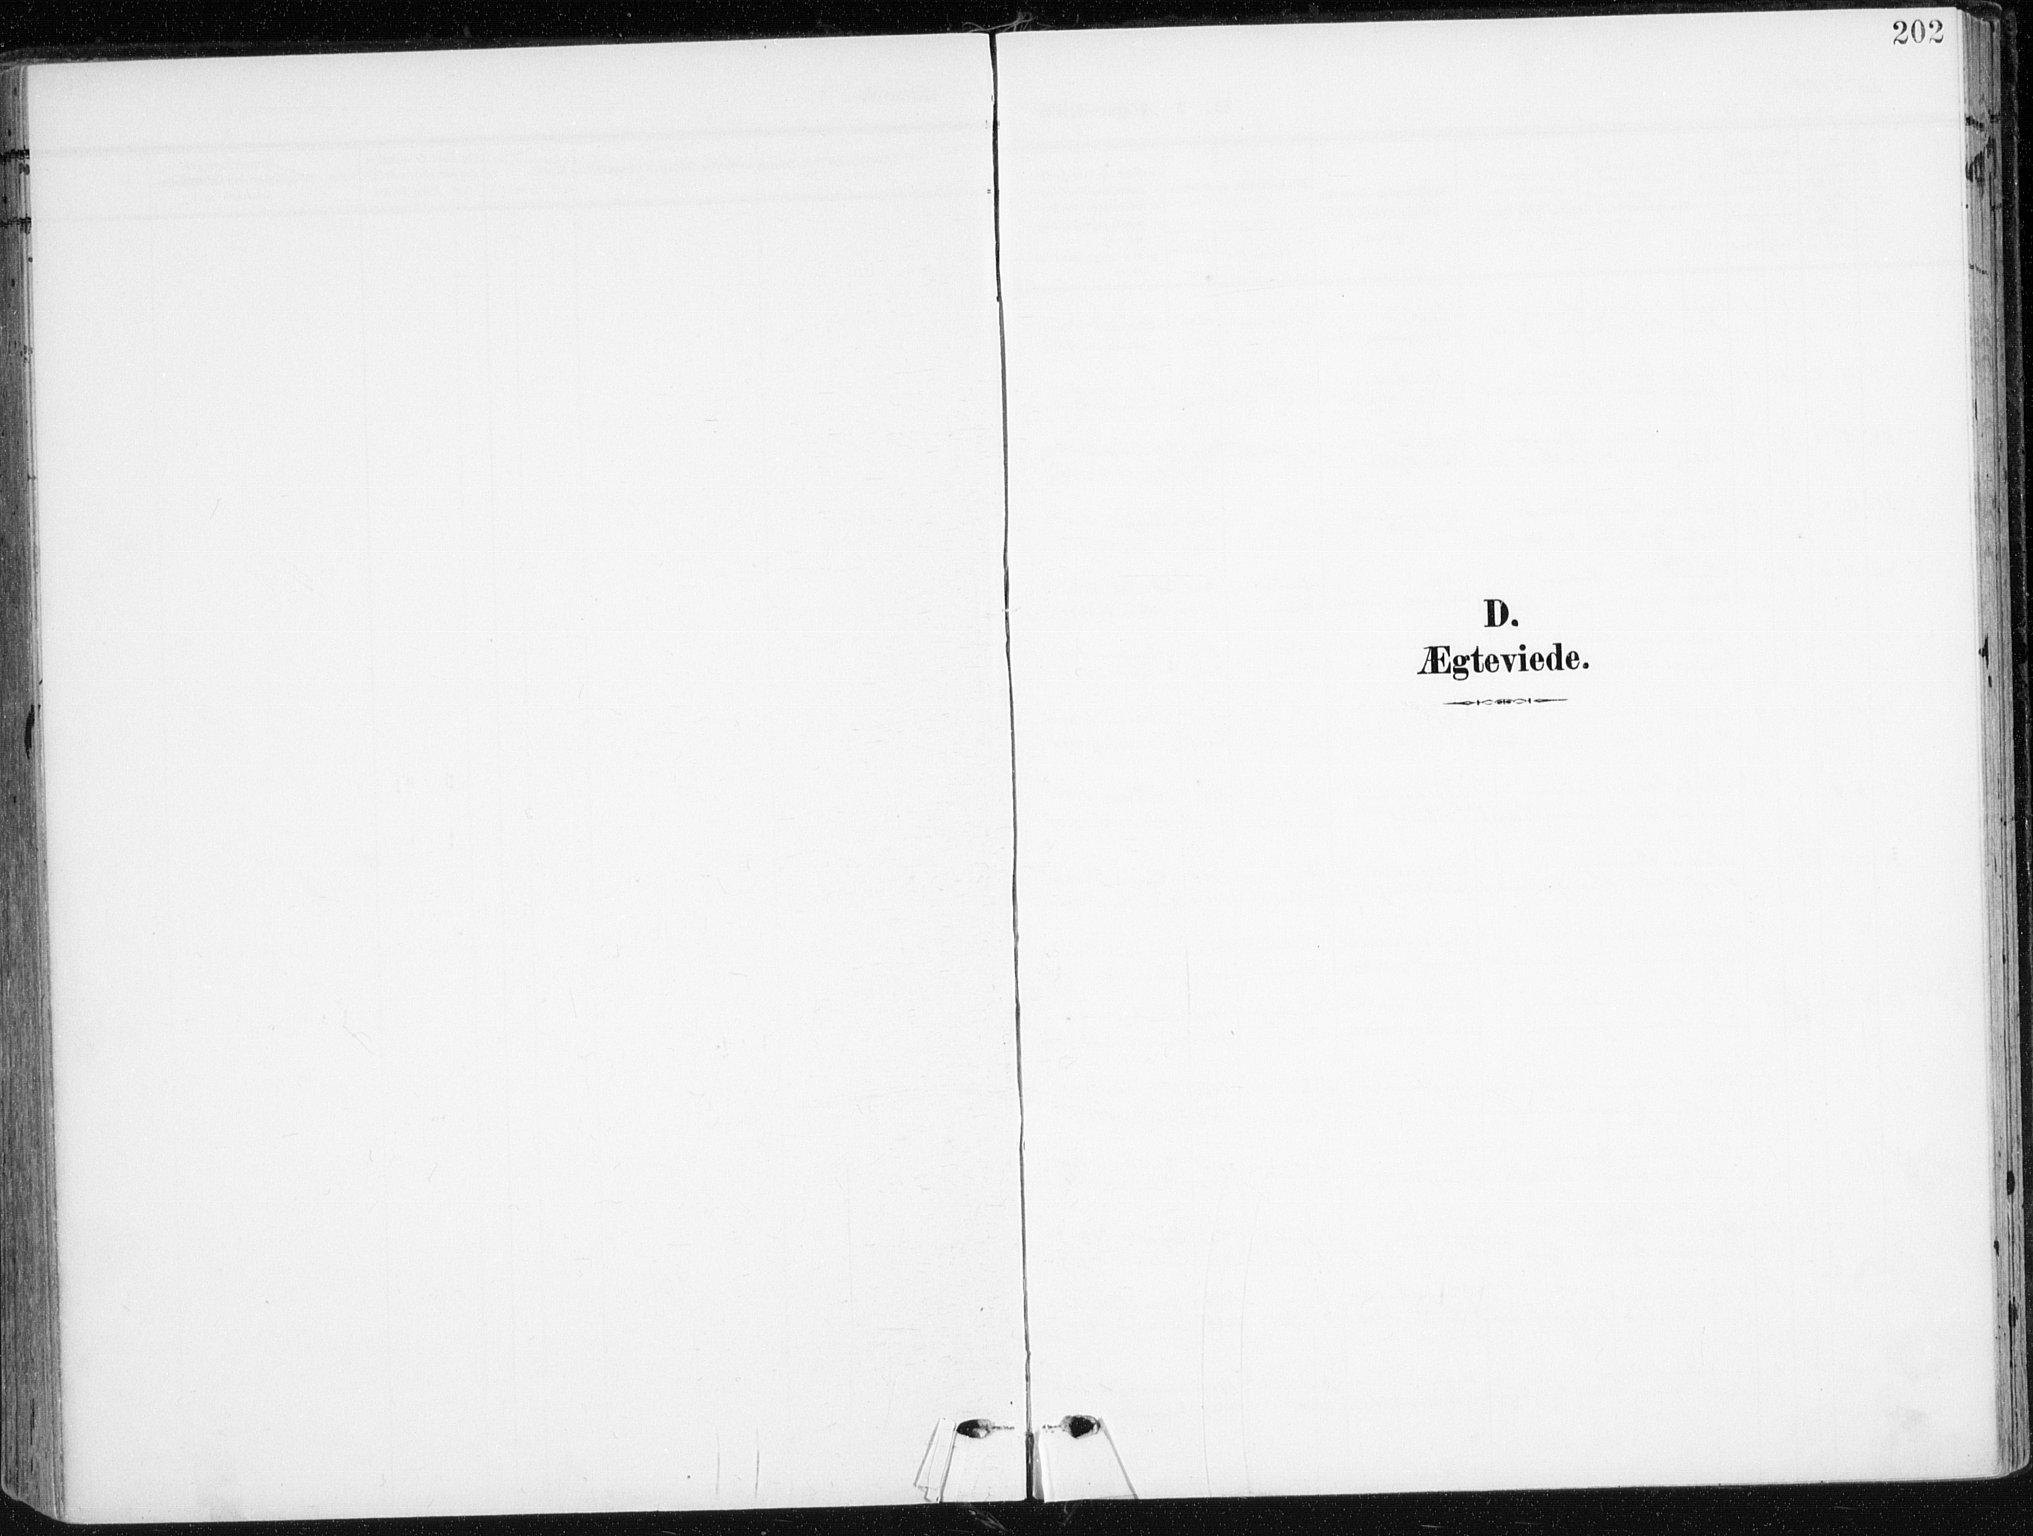 SAO, Kampen prestekontor Kirkebøker, F/Fa/L0011: Ministerialbok nr. I 11, 1907-1917, s. 202